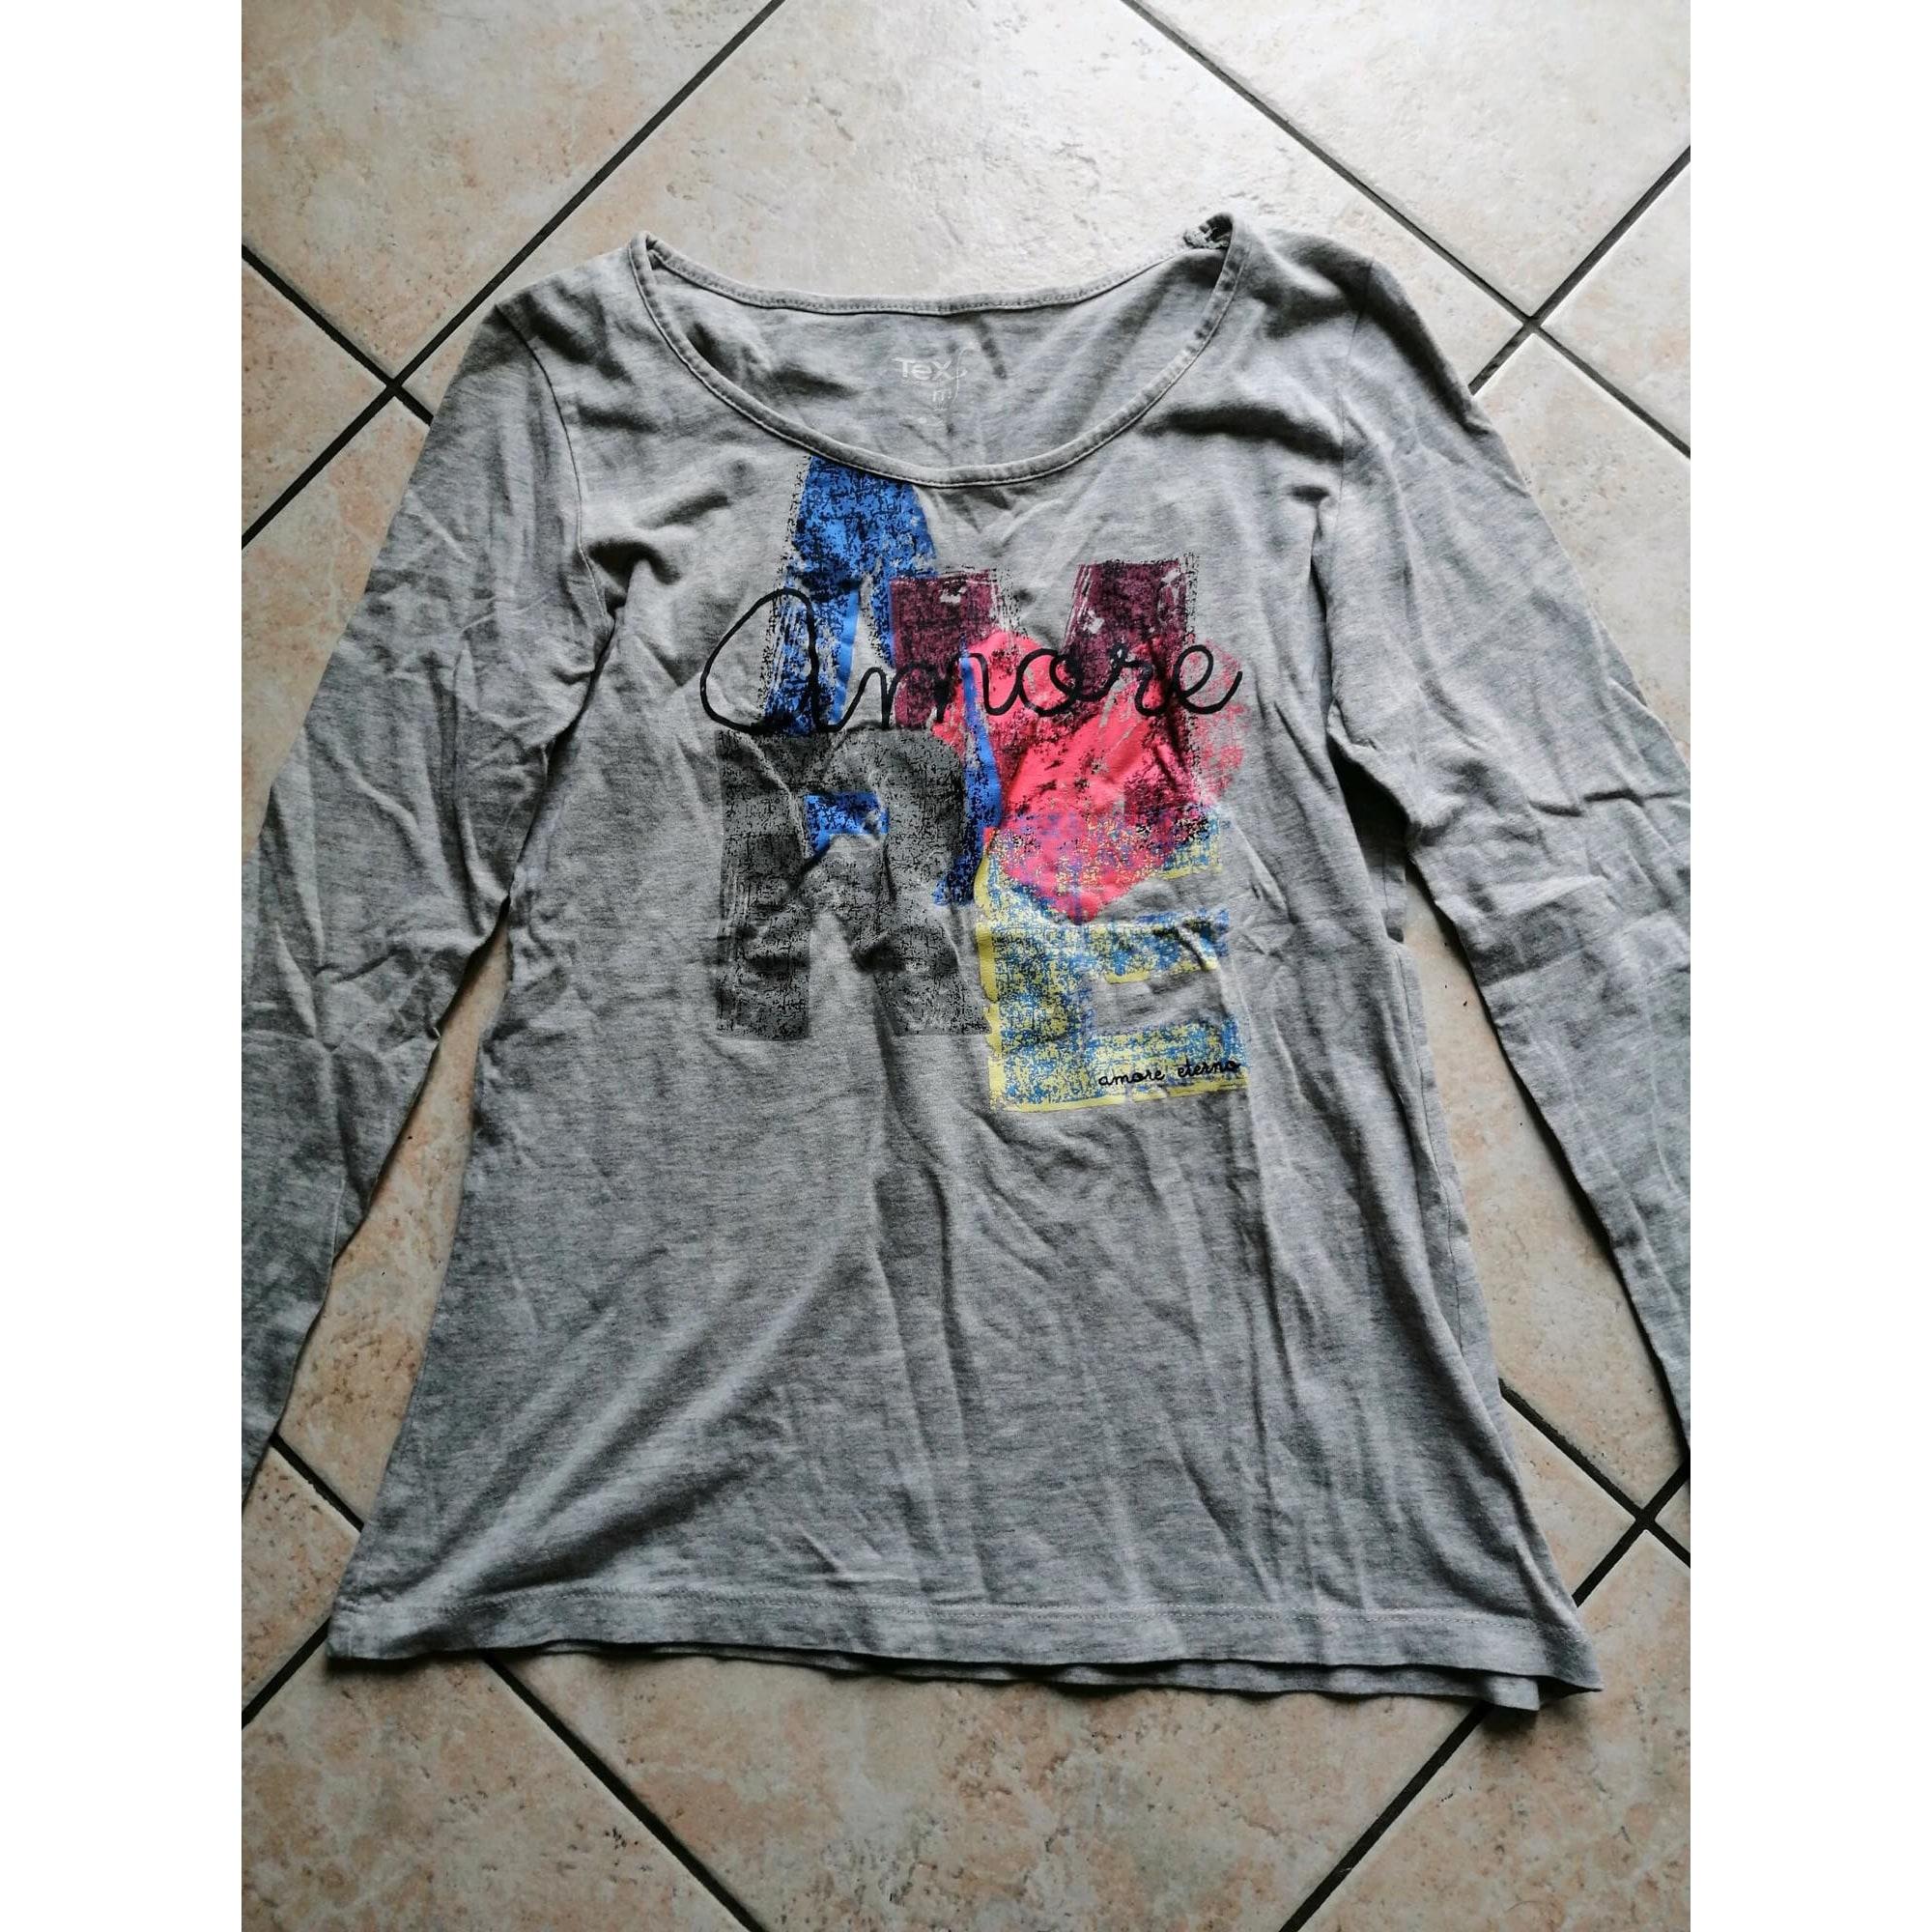 Top, tee-shirt TEX Gris, anthracite